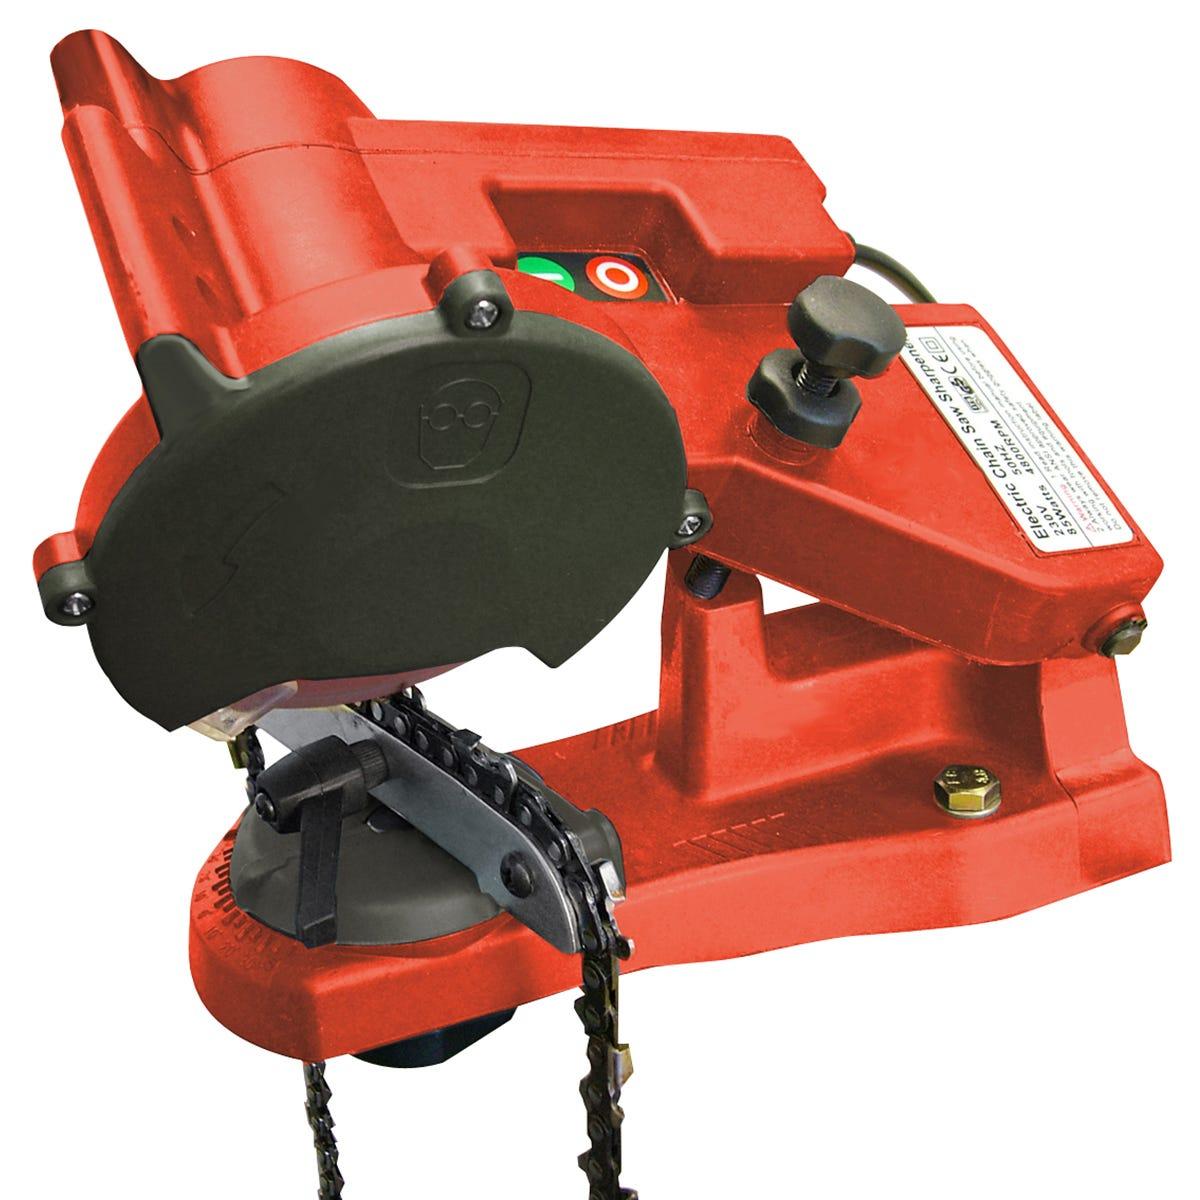 Faithfull Electric Chainsaw Sharpener 85W